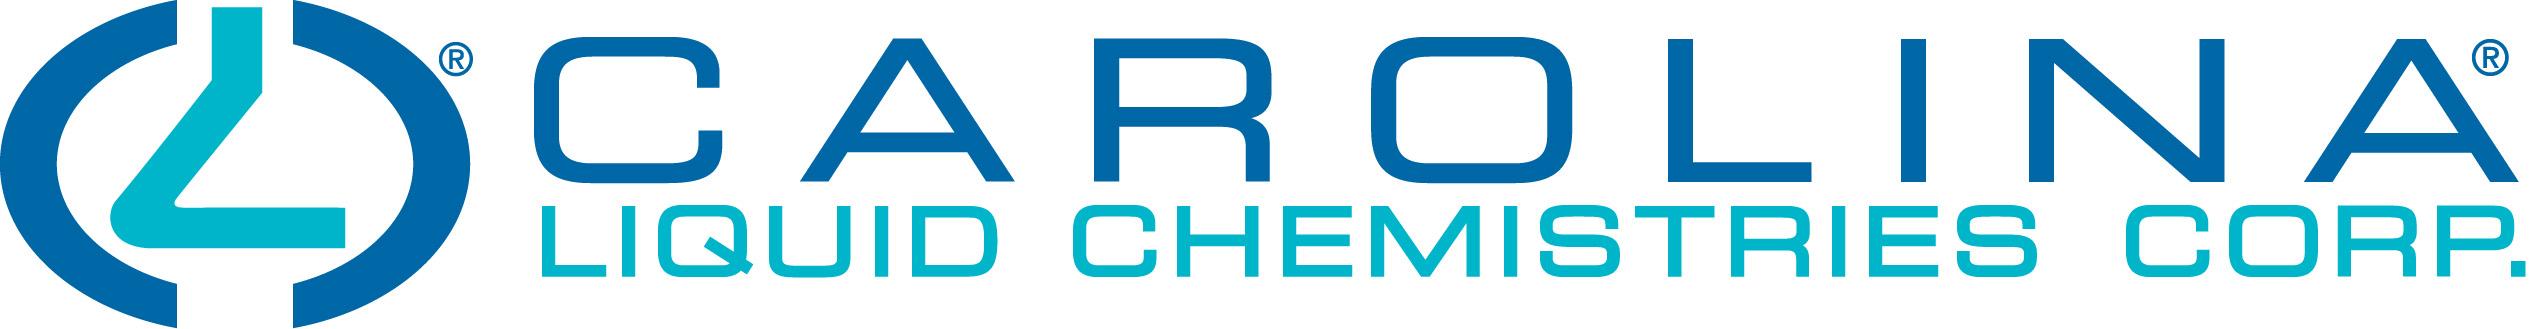 Carolina Liquid Chemistries Corp